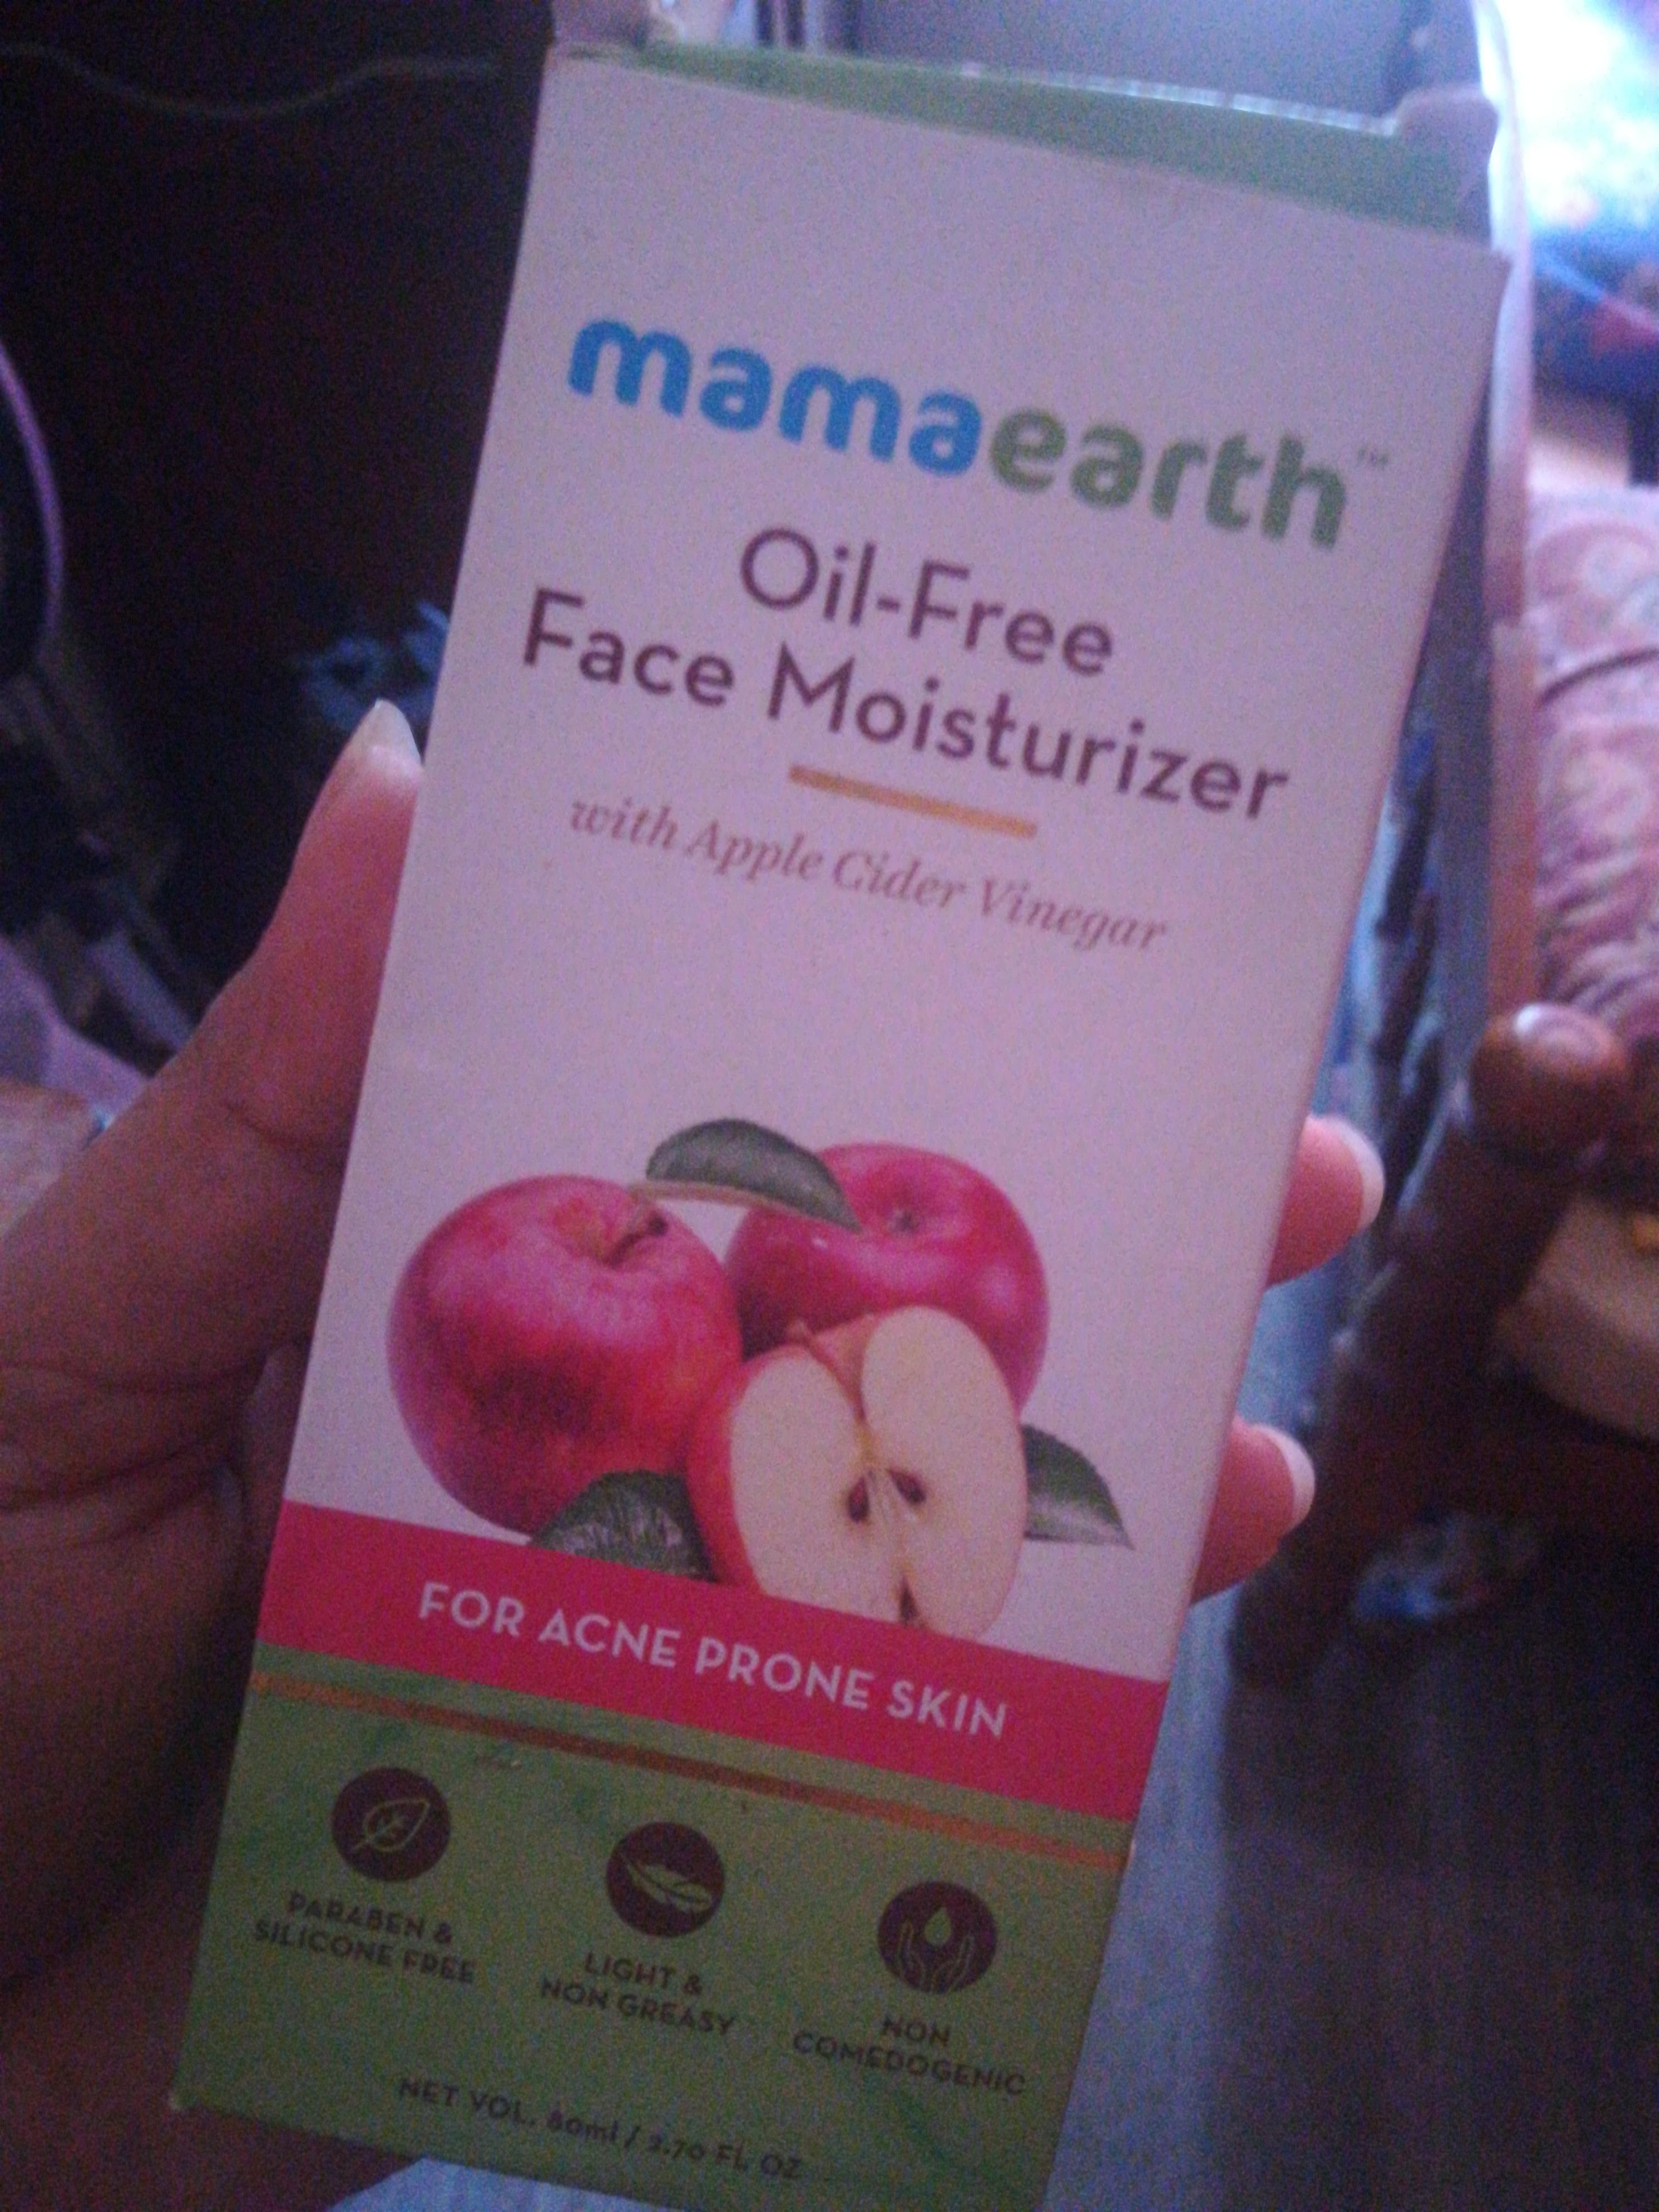 Mamaearth Oil Free Face Moisturizer With Apple Cider Vinegar-BEST MOISTURISER FOR OILY SKIN-By vaishnavi11